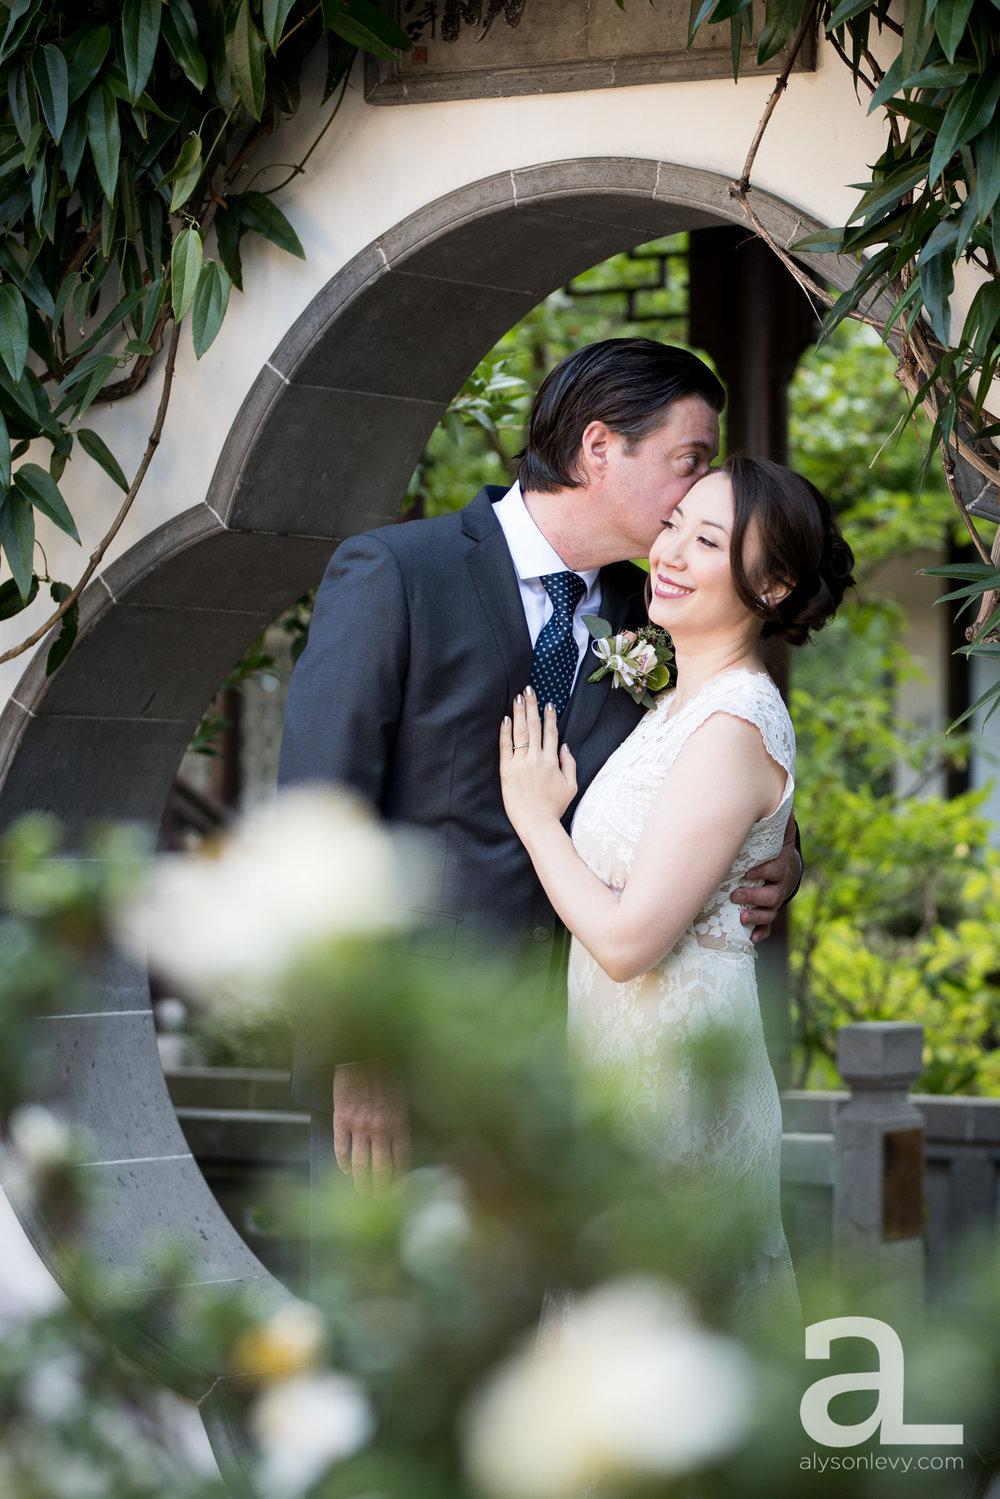 Lan-Su-Portland-Wedding-Photography-002.jpg